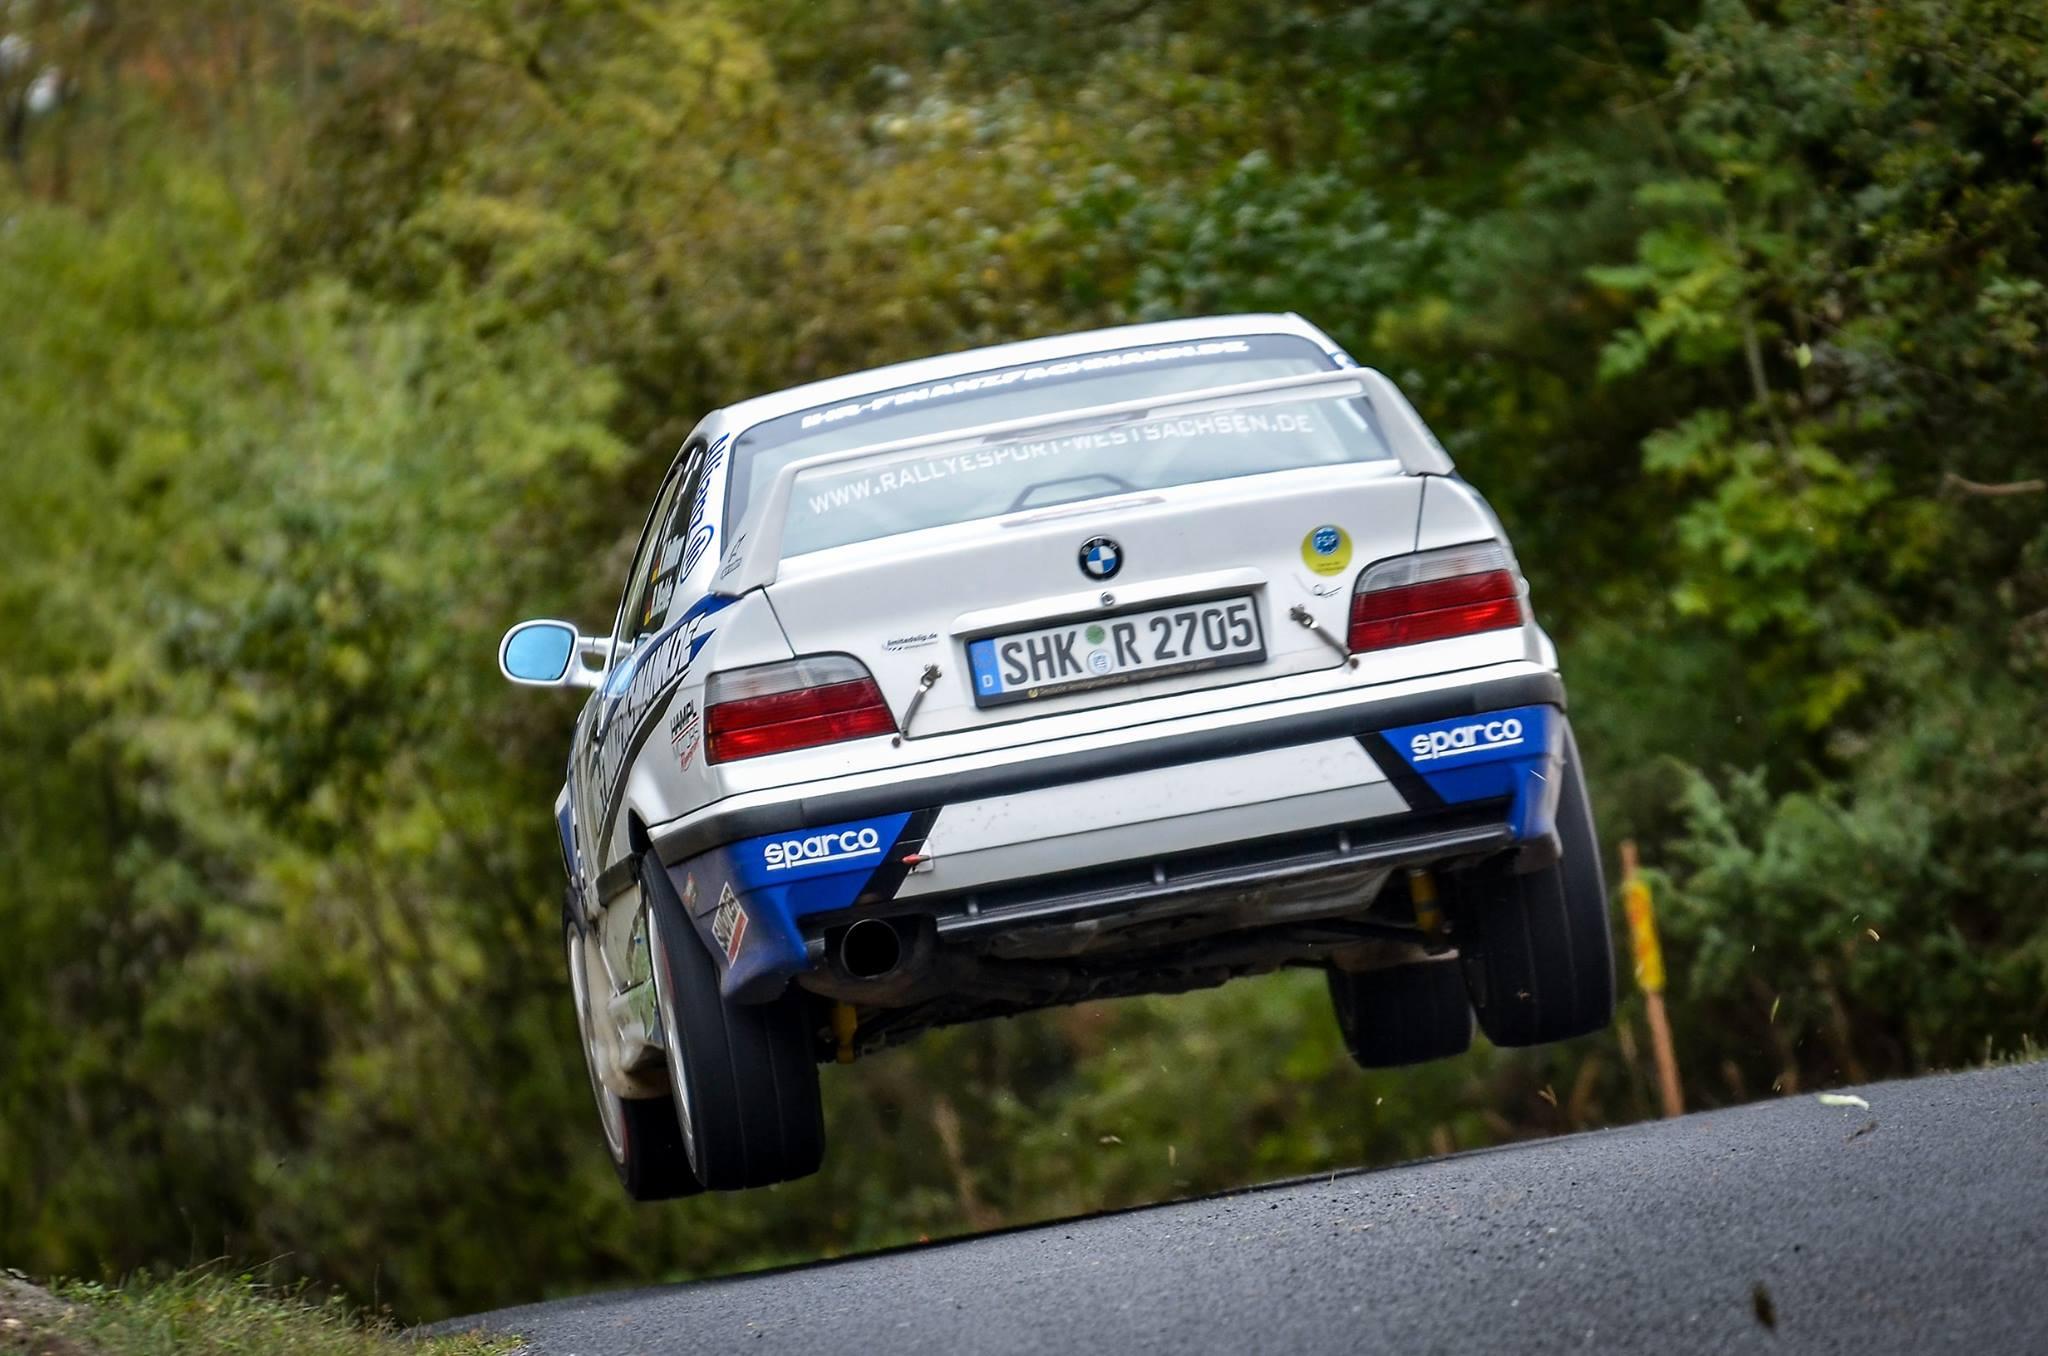 Gollert 2016 Sprung BMW